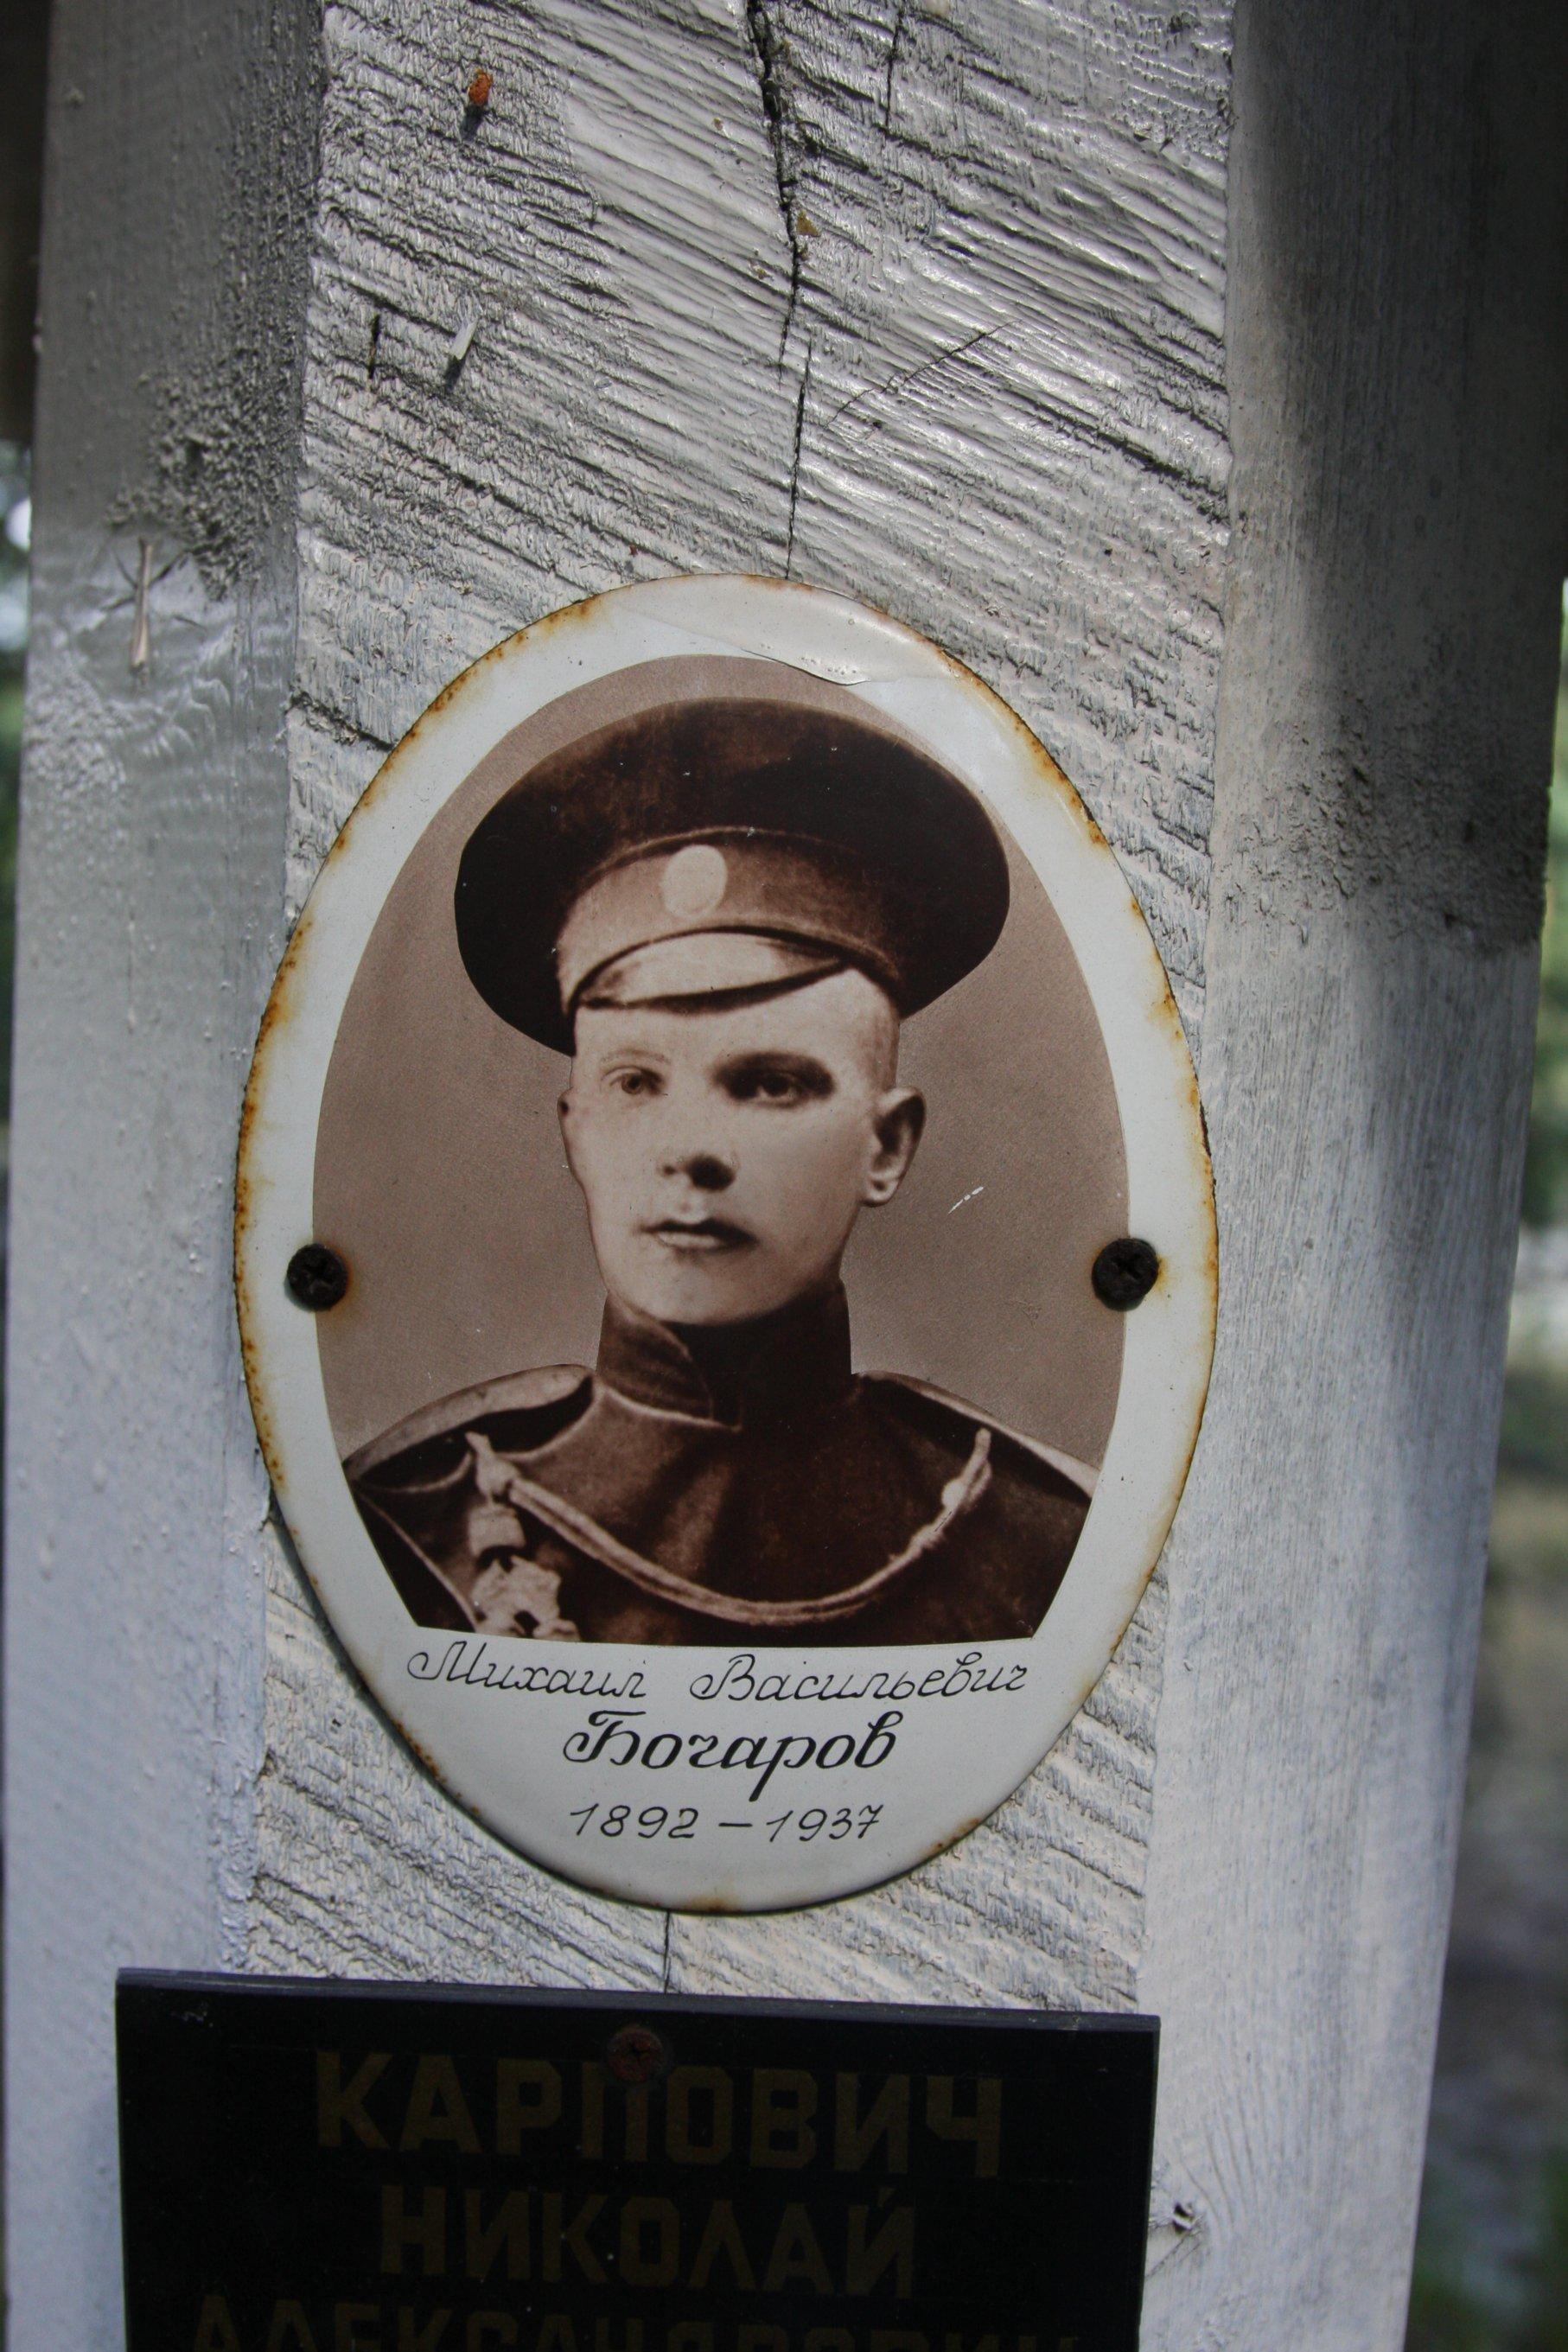 Памятная табличка «Михаил Васильевич Бочаров». Фото 04.08.2018.